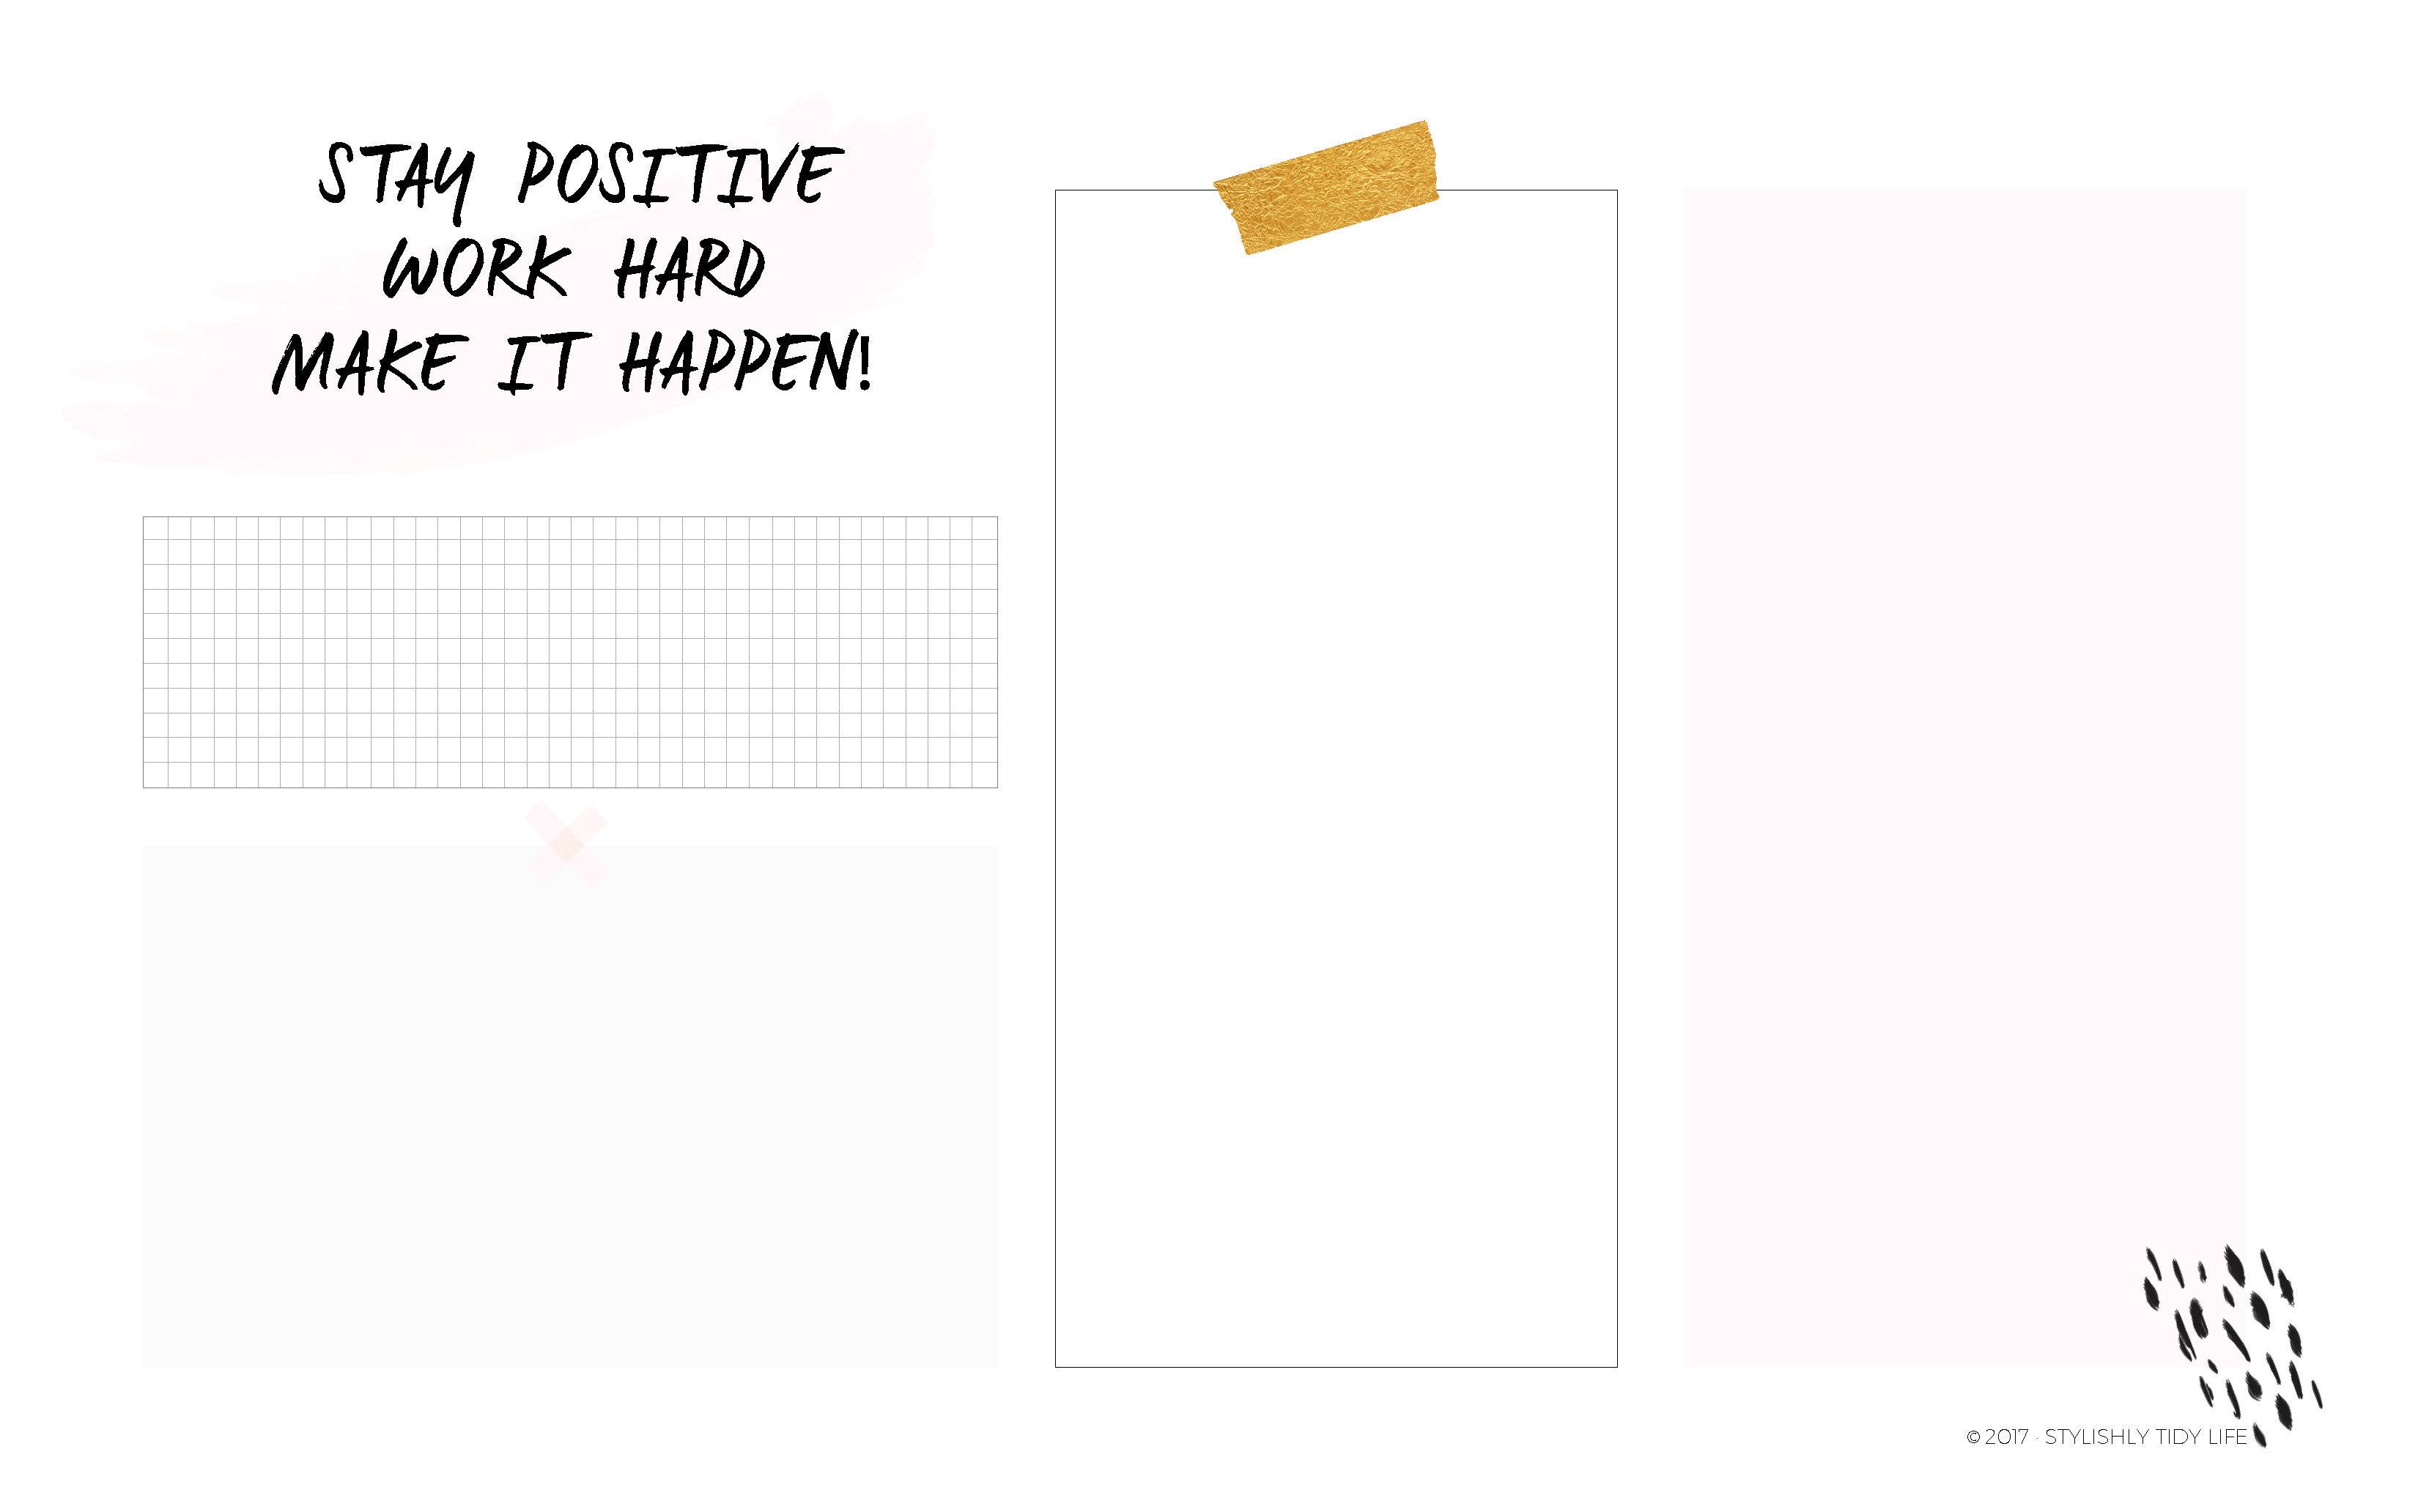 Making Things Happen Latest Organizational Desktop Wallpaper Free Download Desktop Wallpaper Organizer Inspirational Desktop Wallpaper Desktop Wallpaper